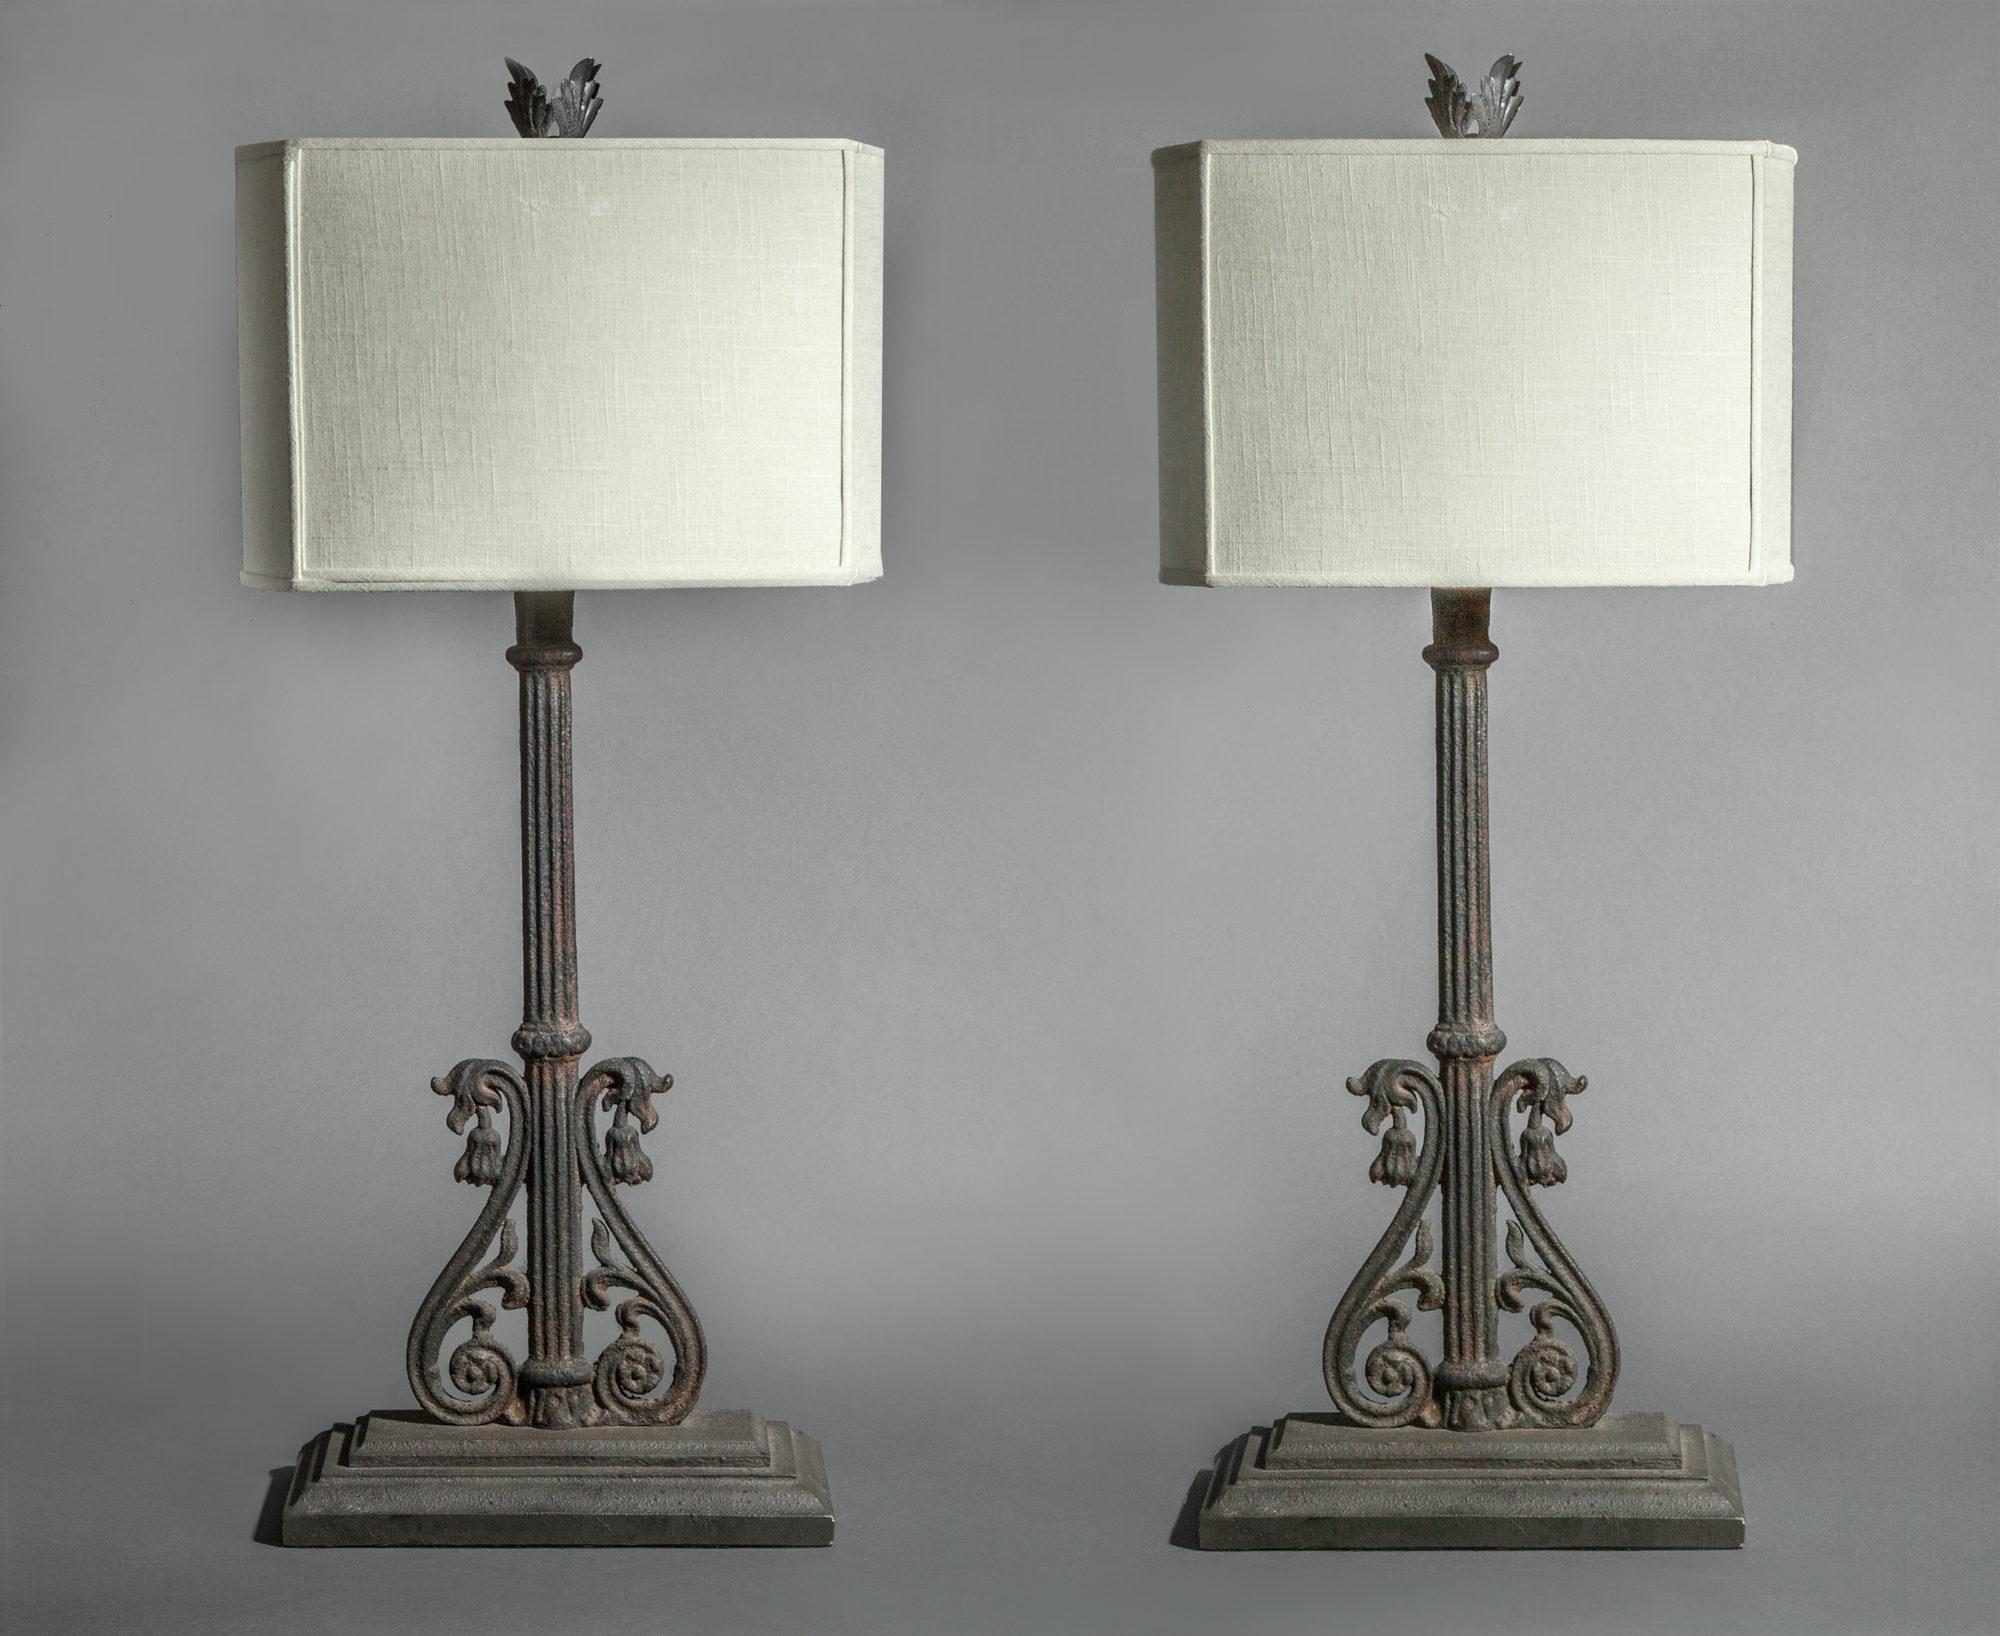 Pair of Lamps Using 19th Century Iron